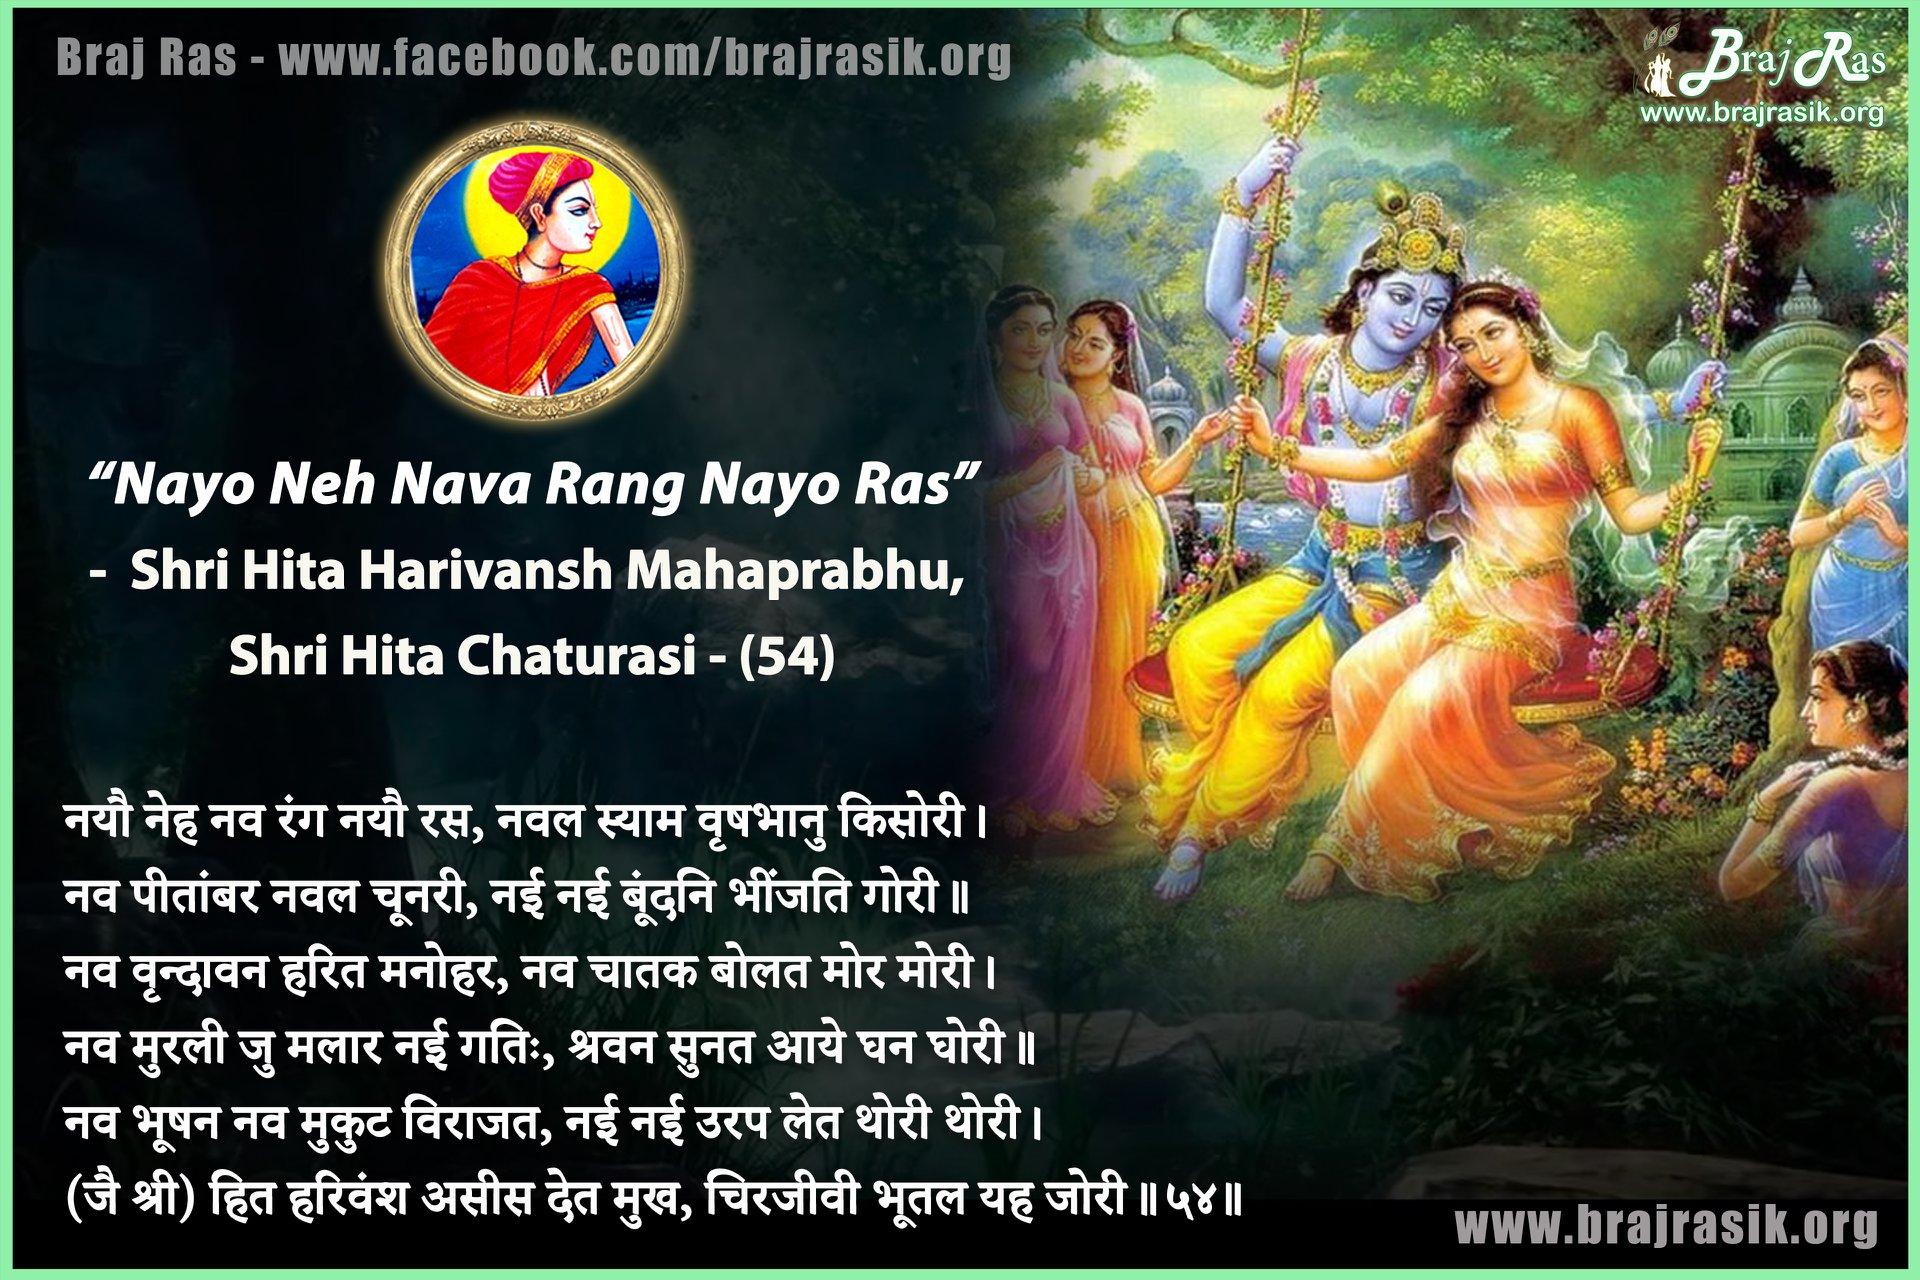 """Nayo Neh Nava Rang Nayo Ras""- Shri Hita Harivansh Mahaprabhu, Shri Hita Chaturasi"